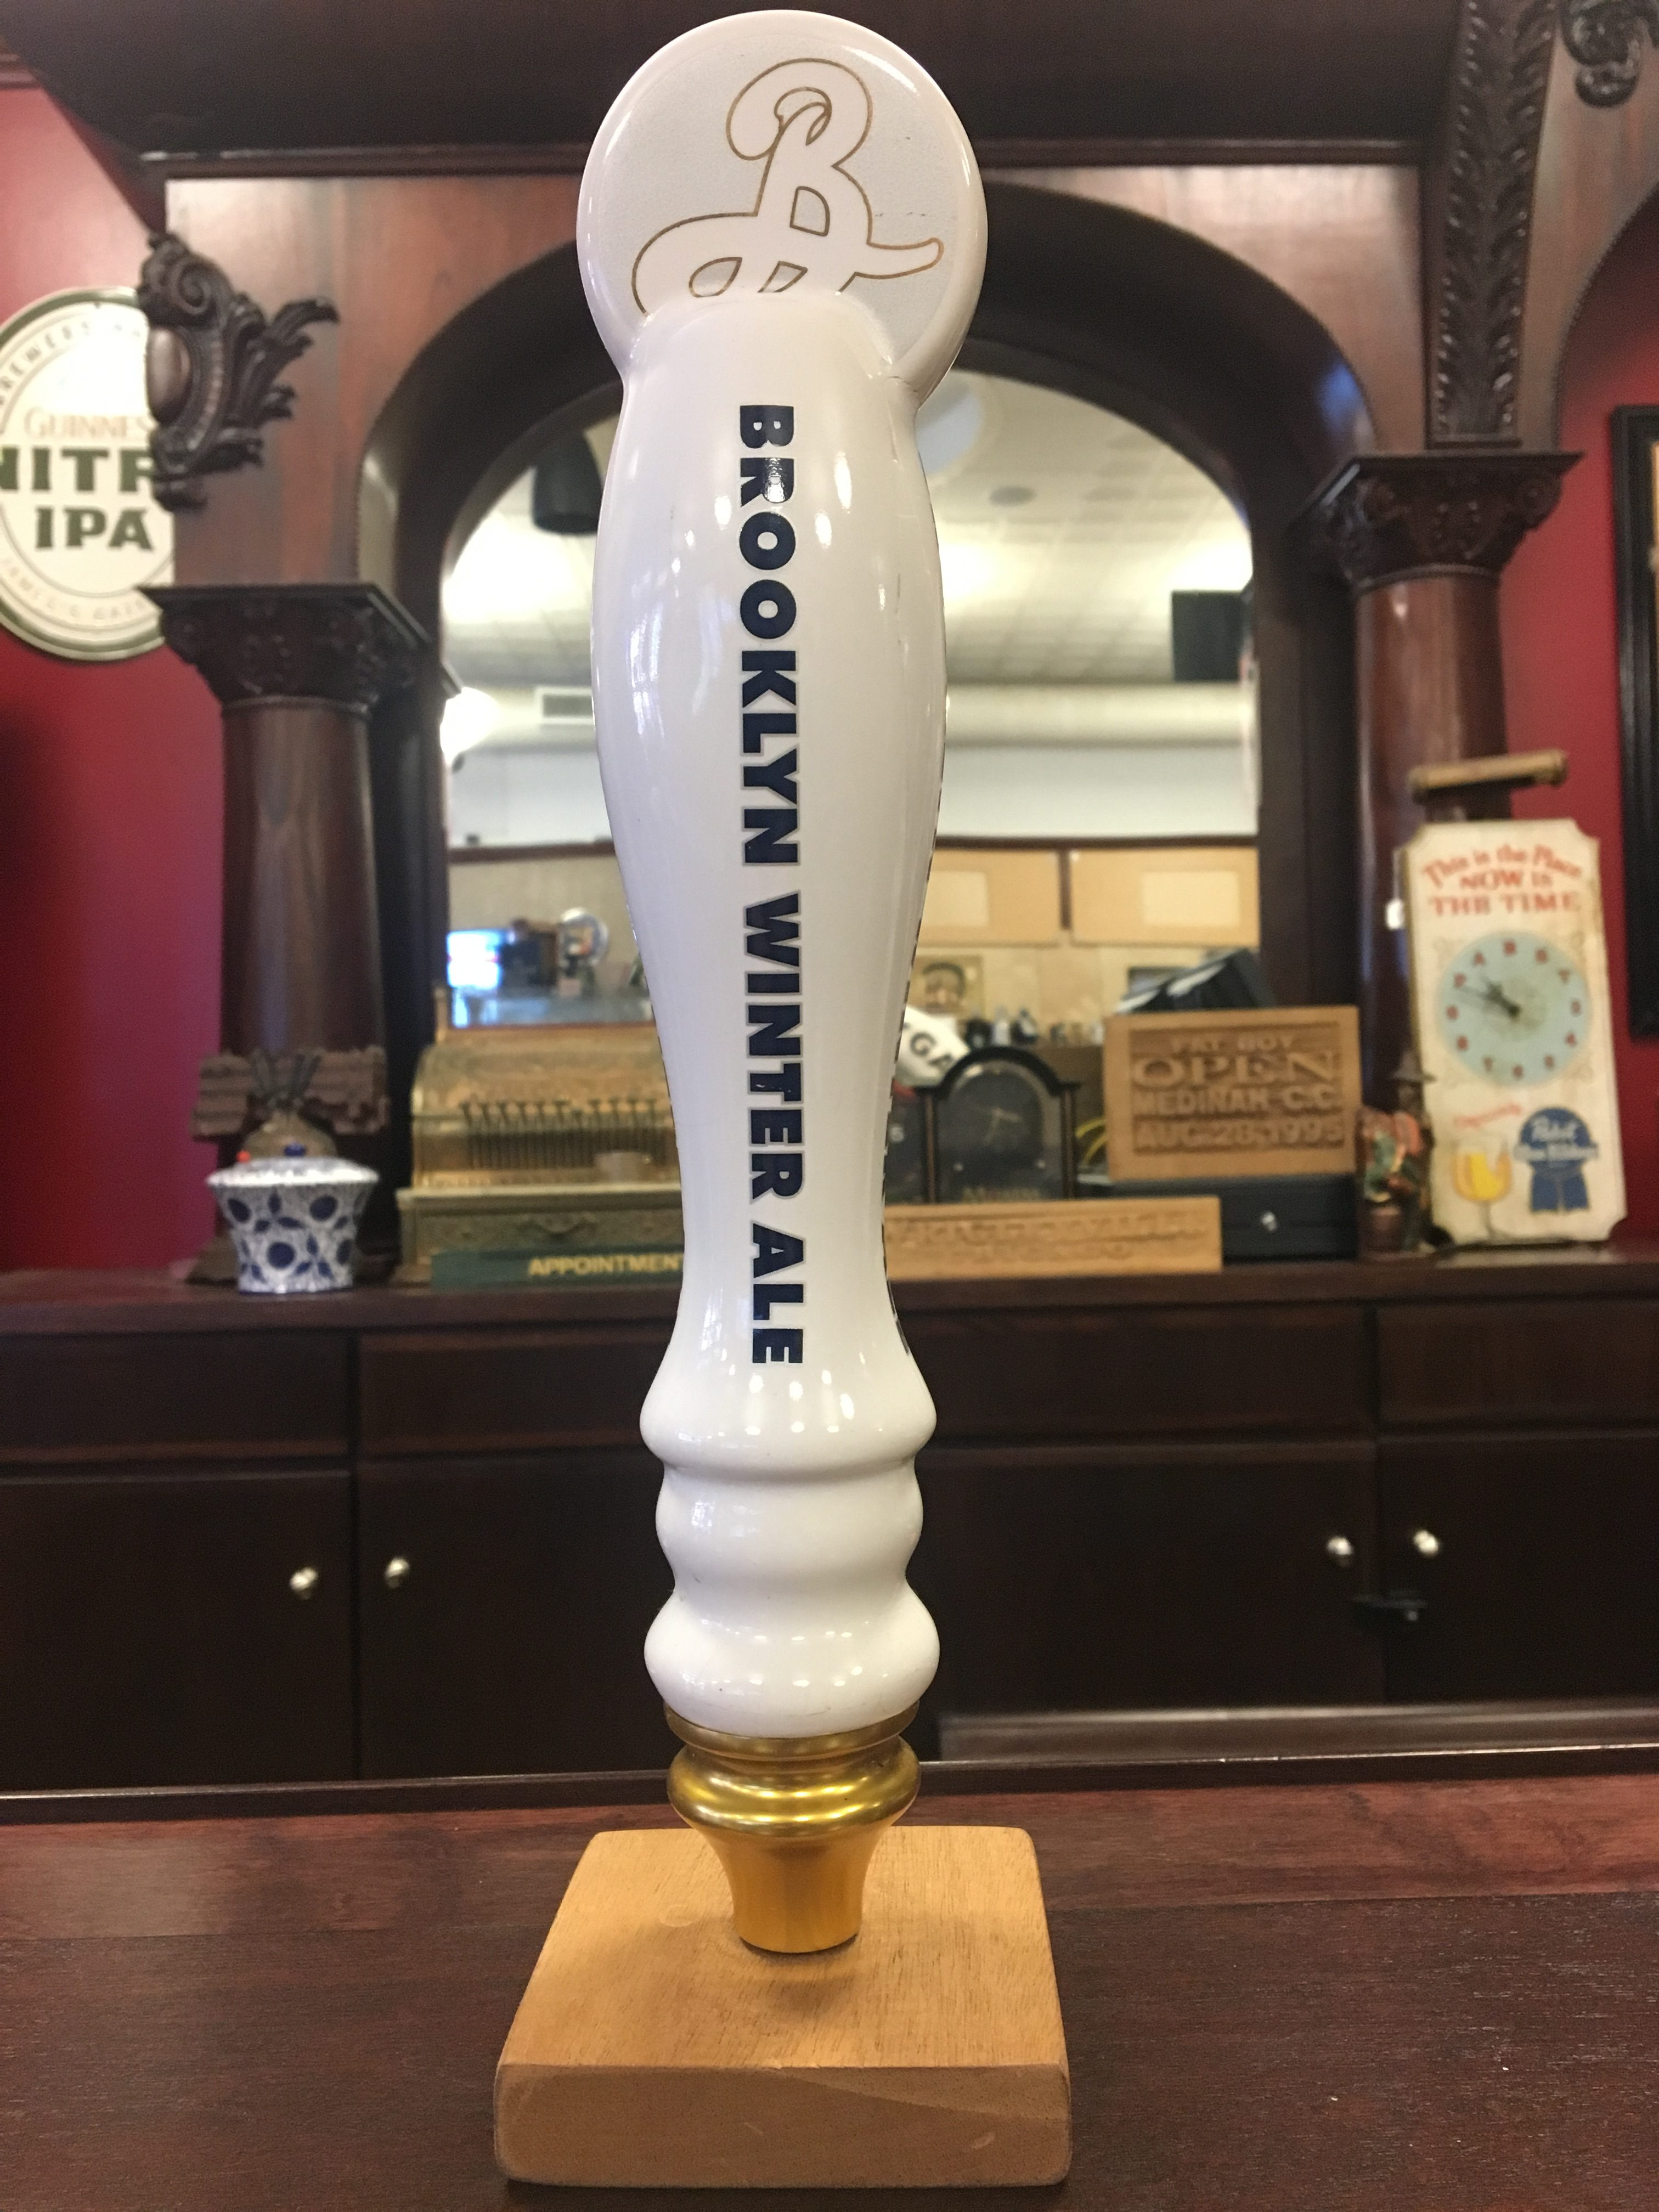 brooklyn brewery winter ale tap handle